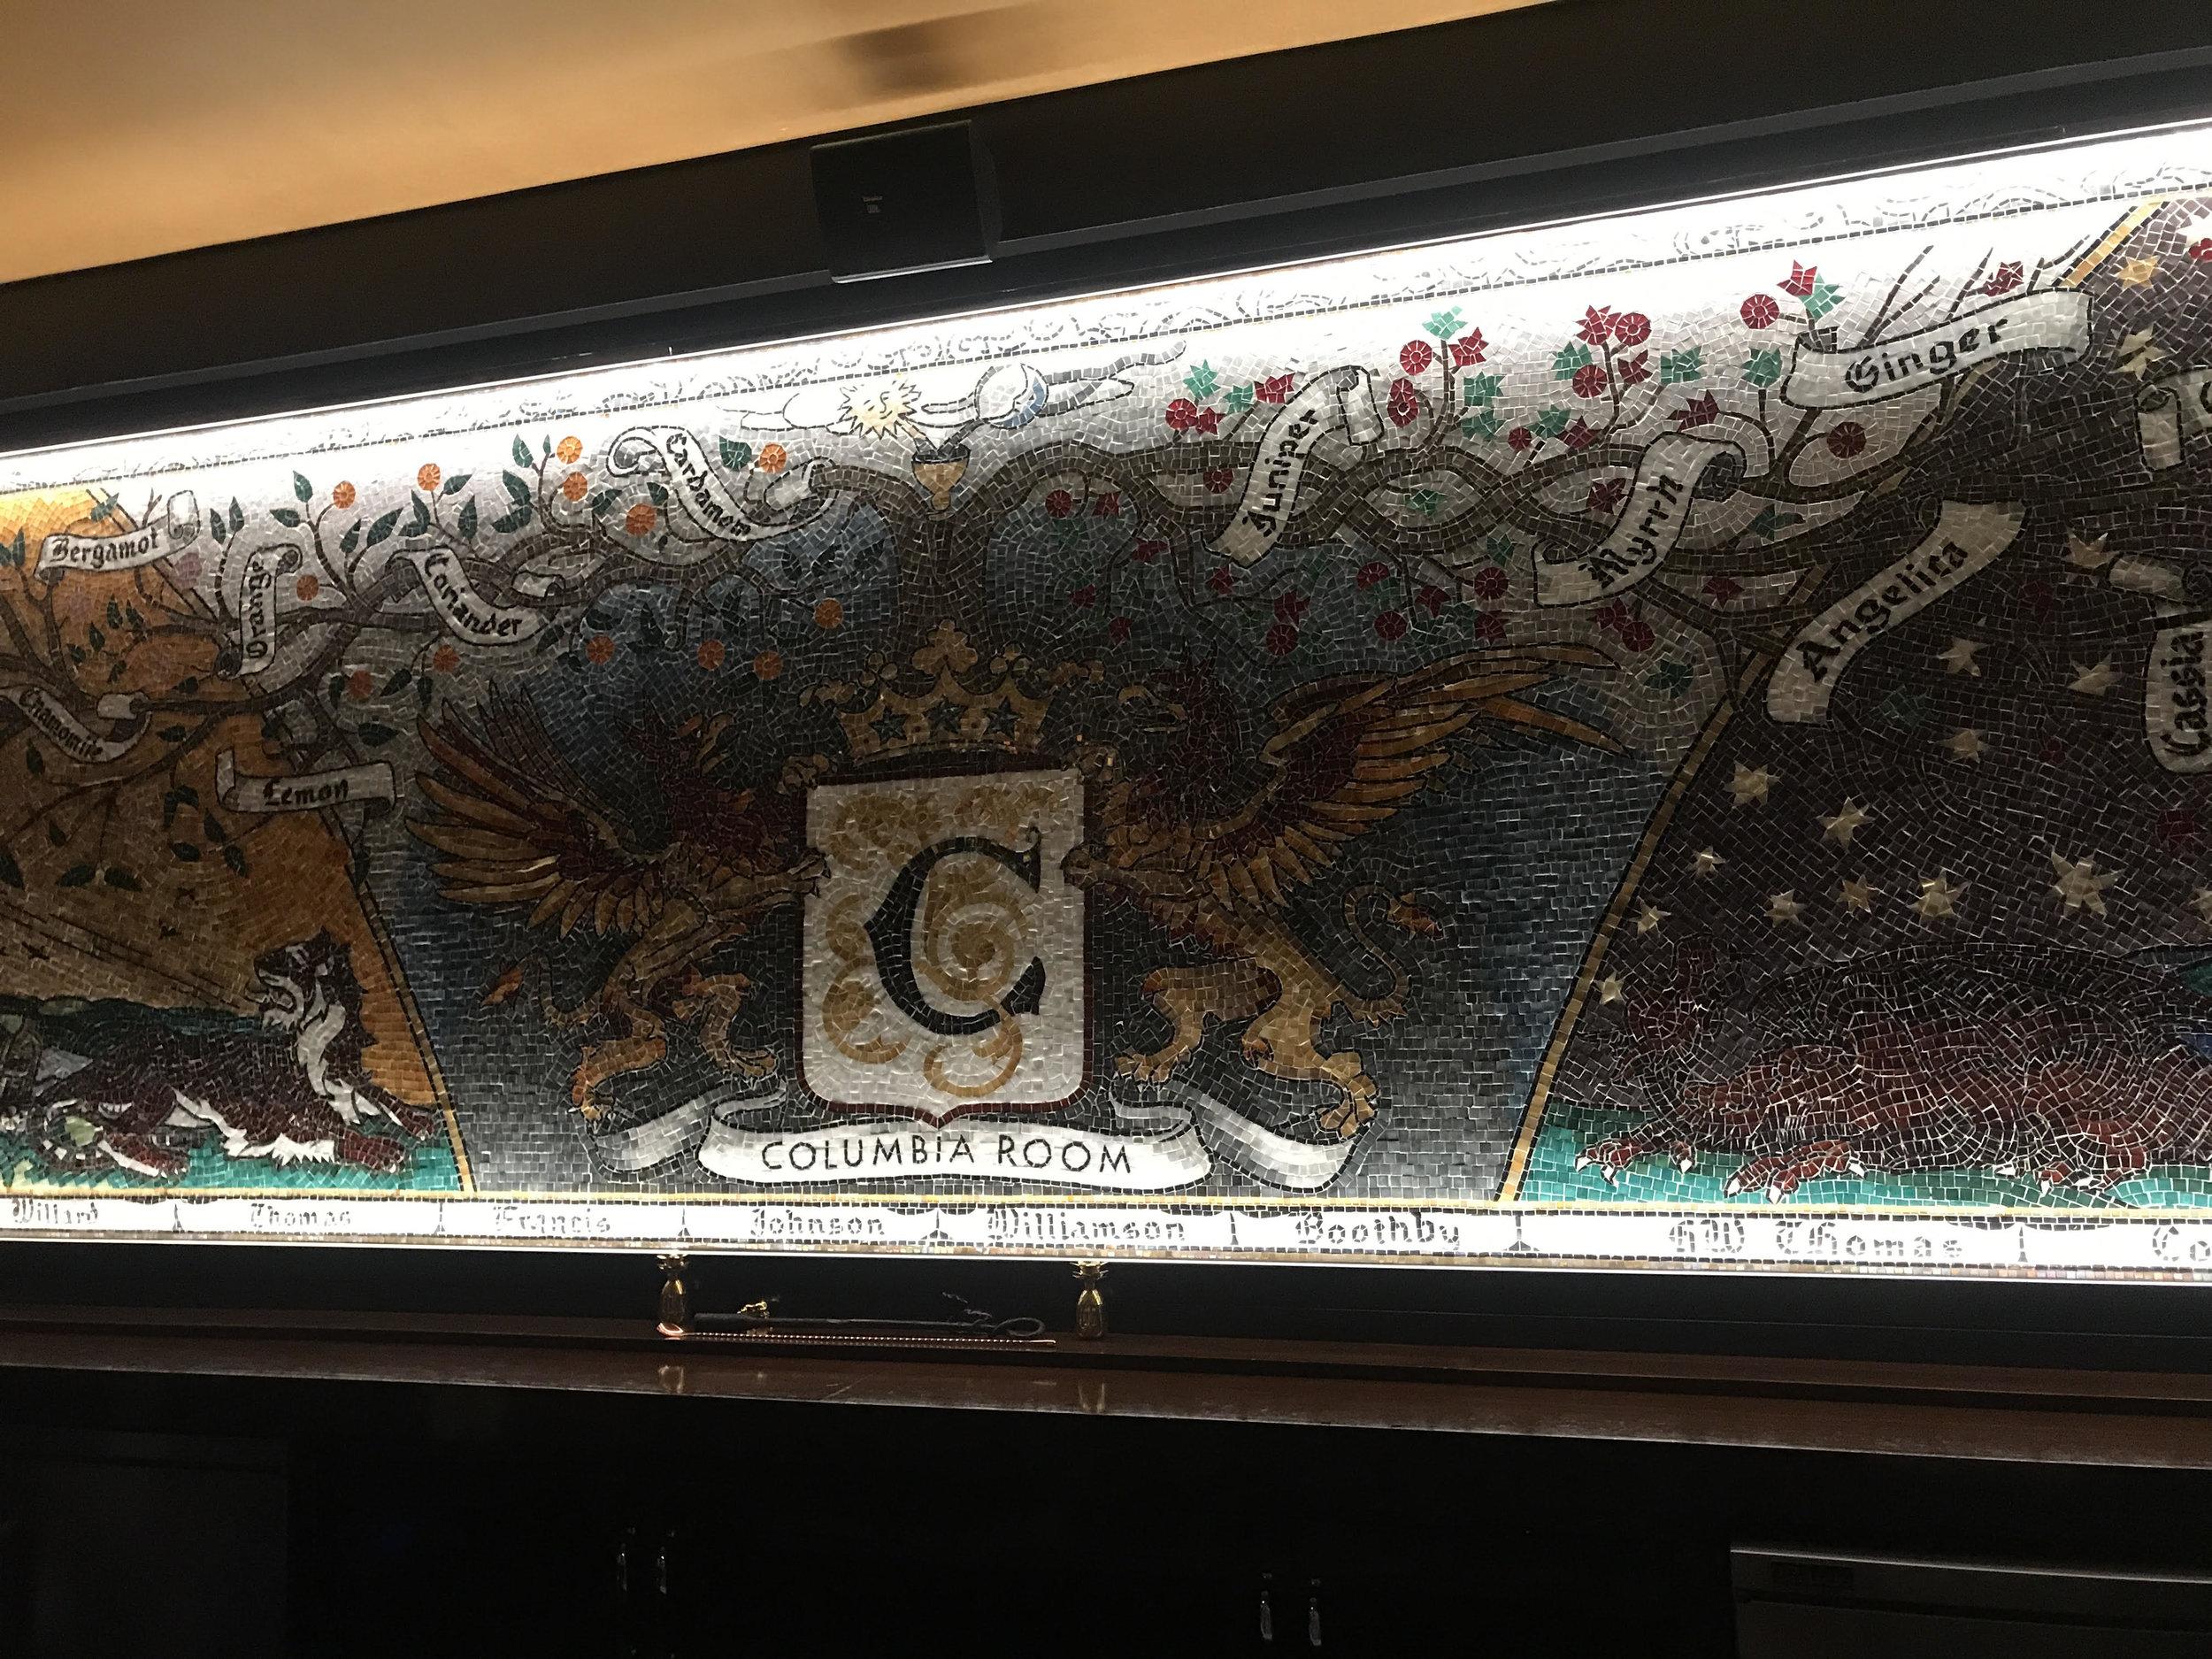 Mural in back room of Columbia Room